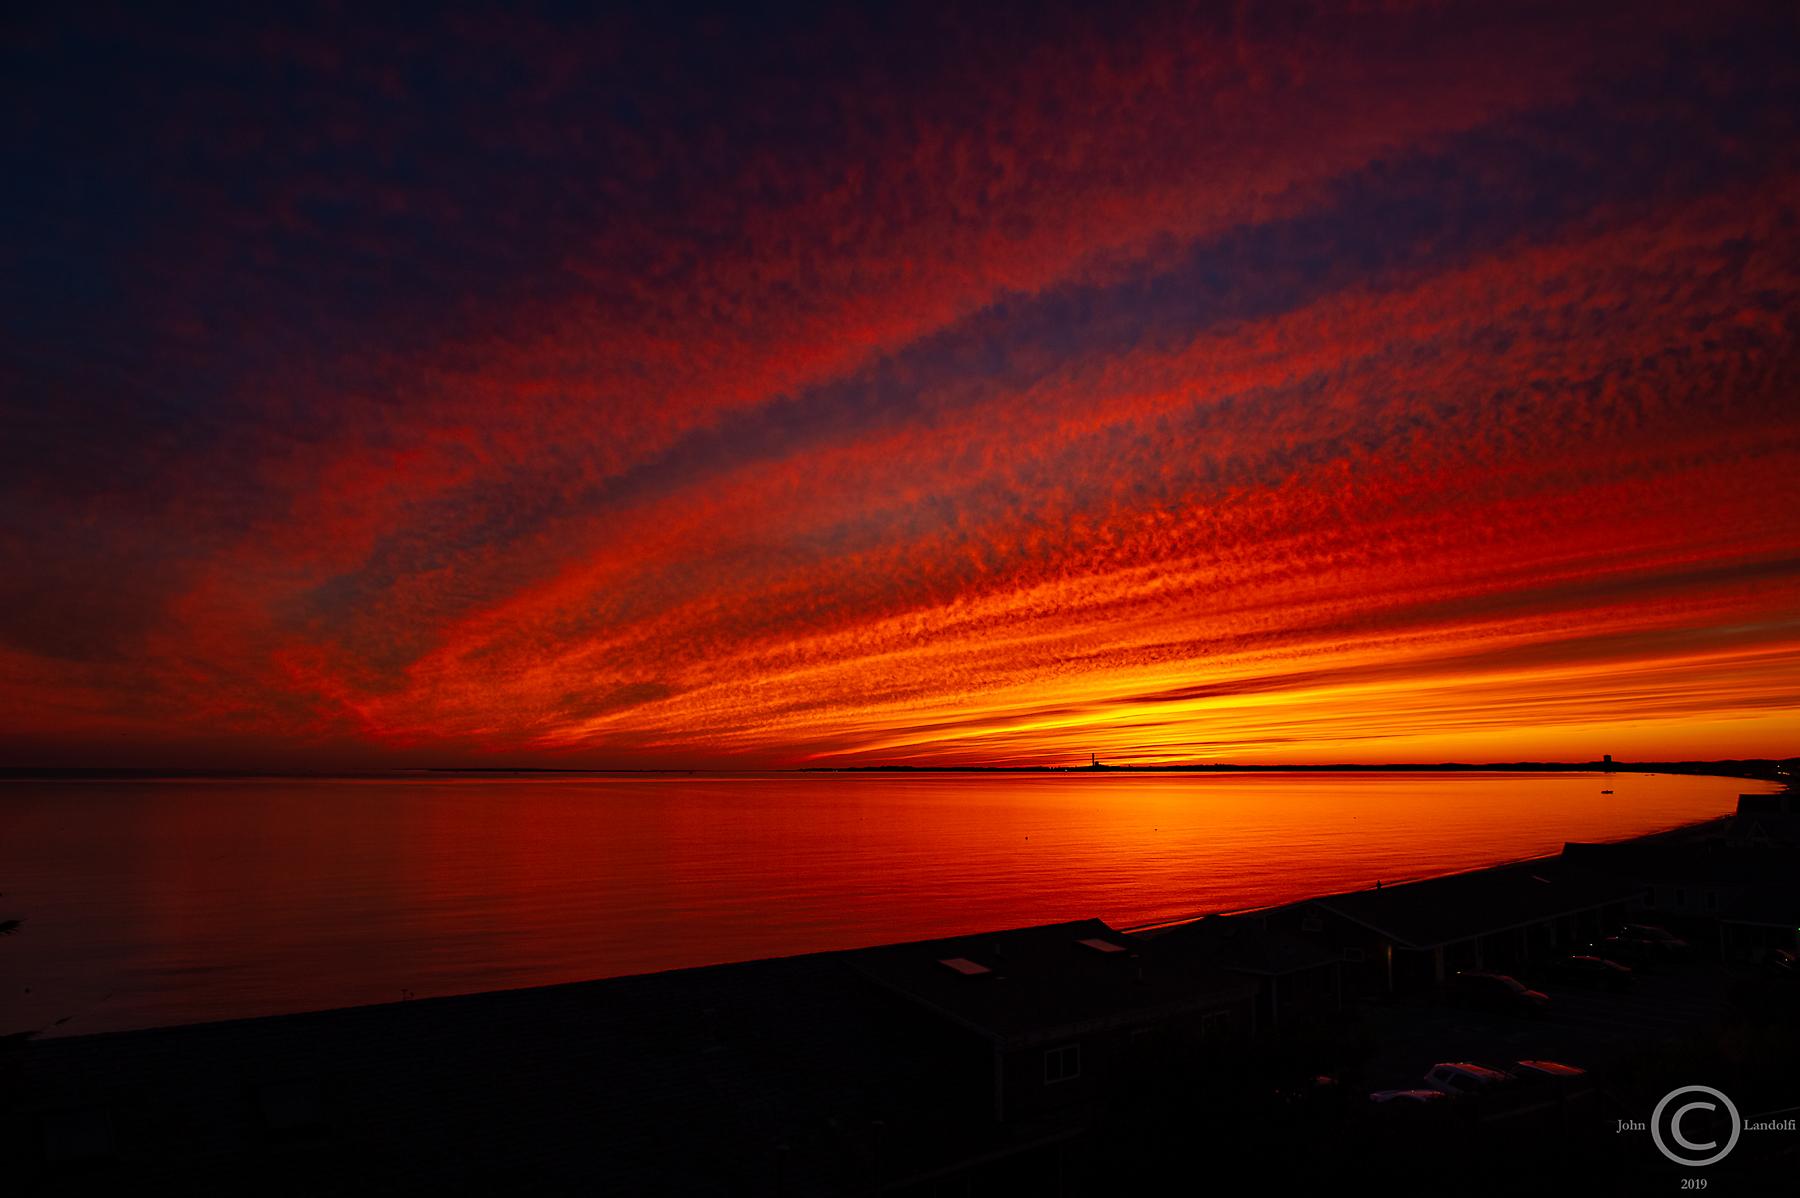 Cape-Cod-2019-Sunset-No7